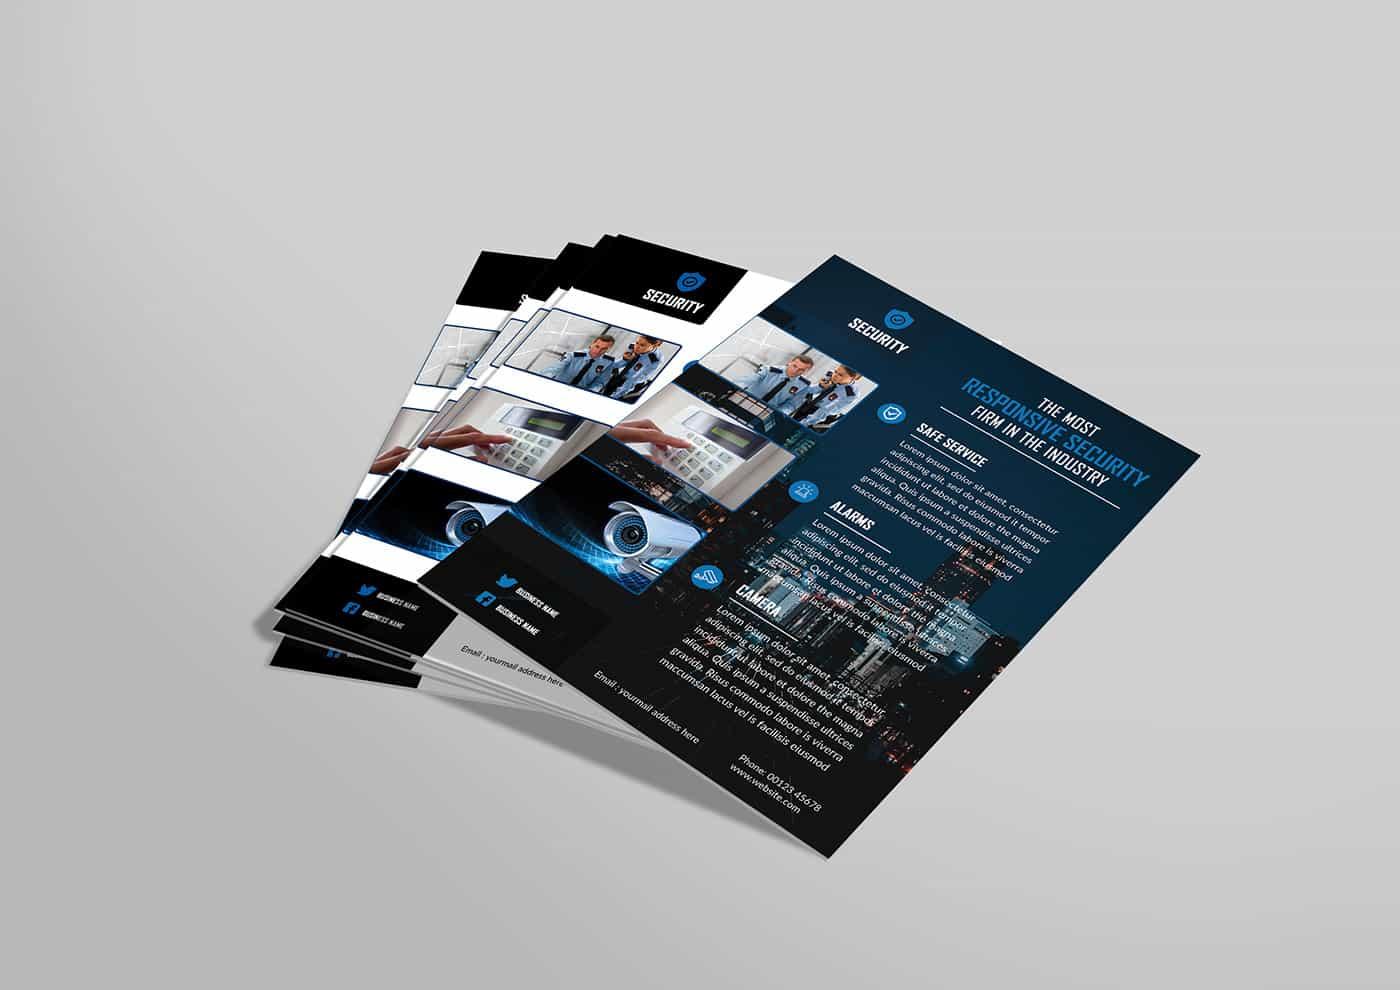 cctv flyer design